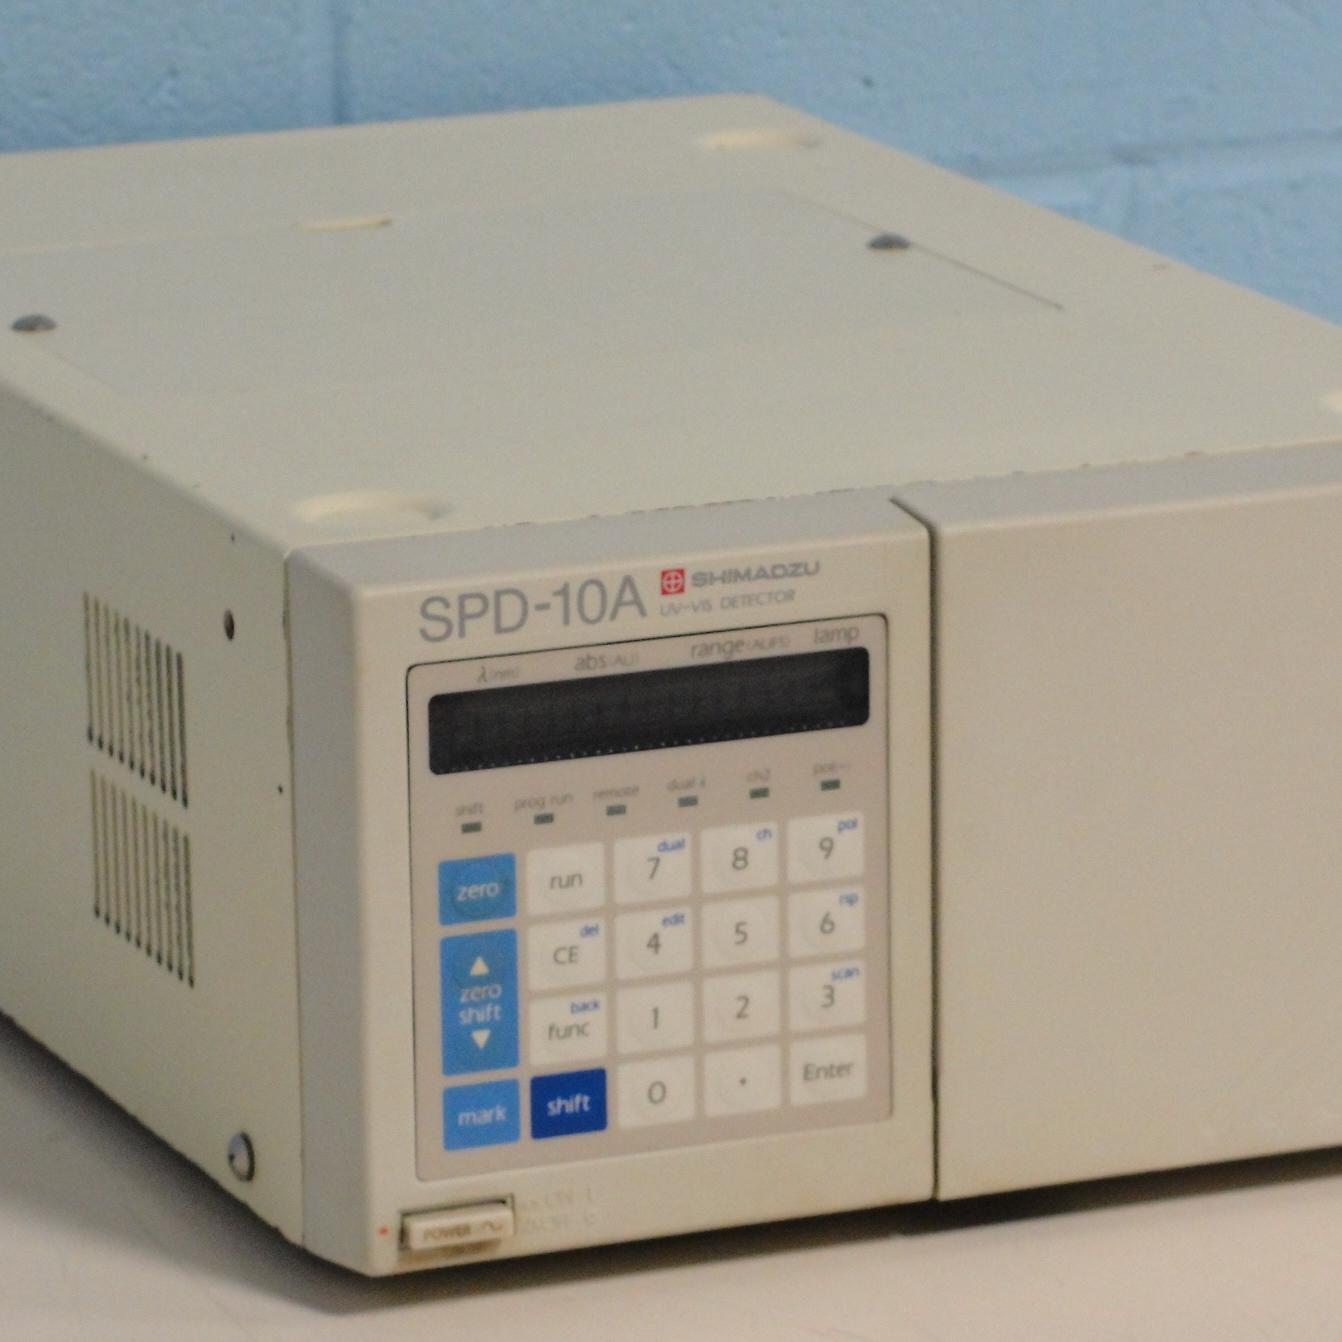 Shimadzu SPD-10A UV/Vis Detector Image